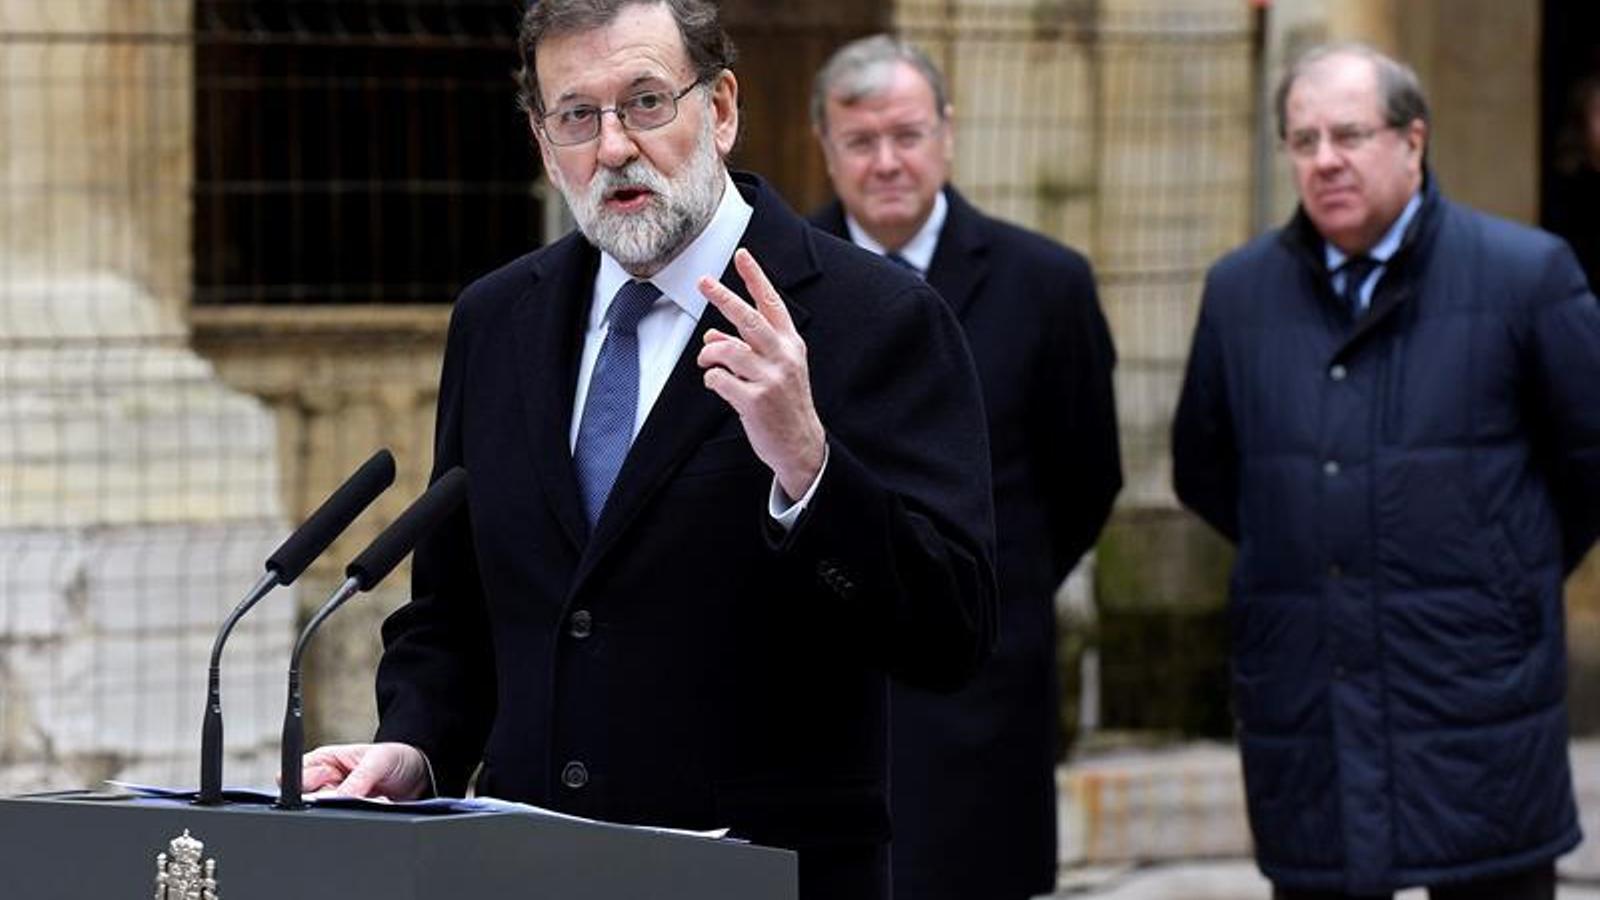 El president del govern espanyol, Mariano Rajoy, a Lleó